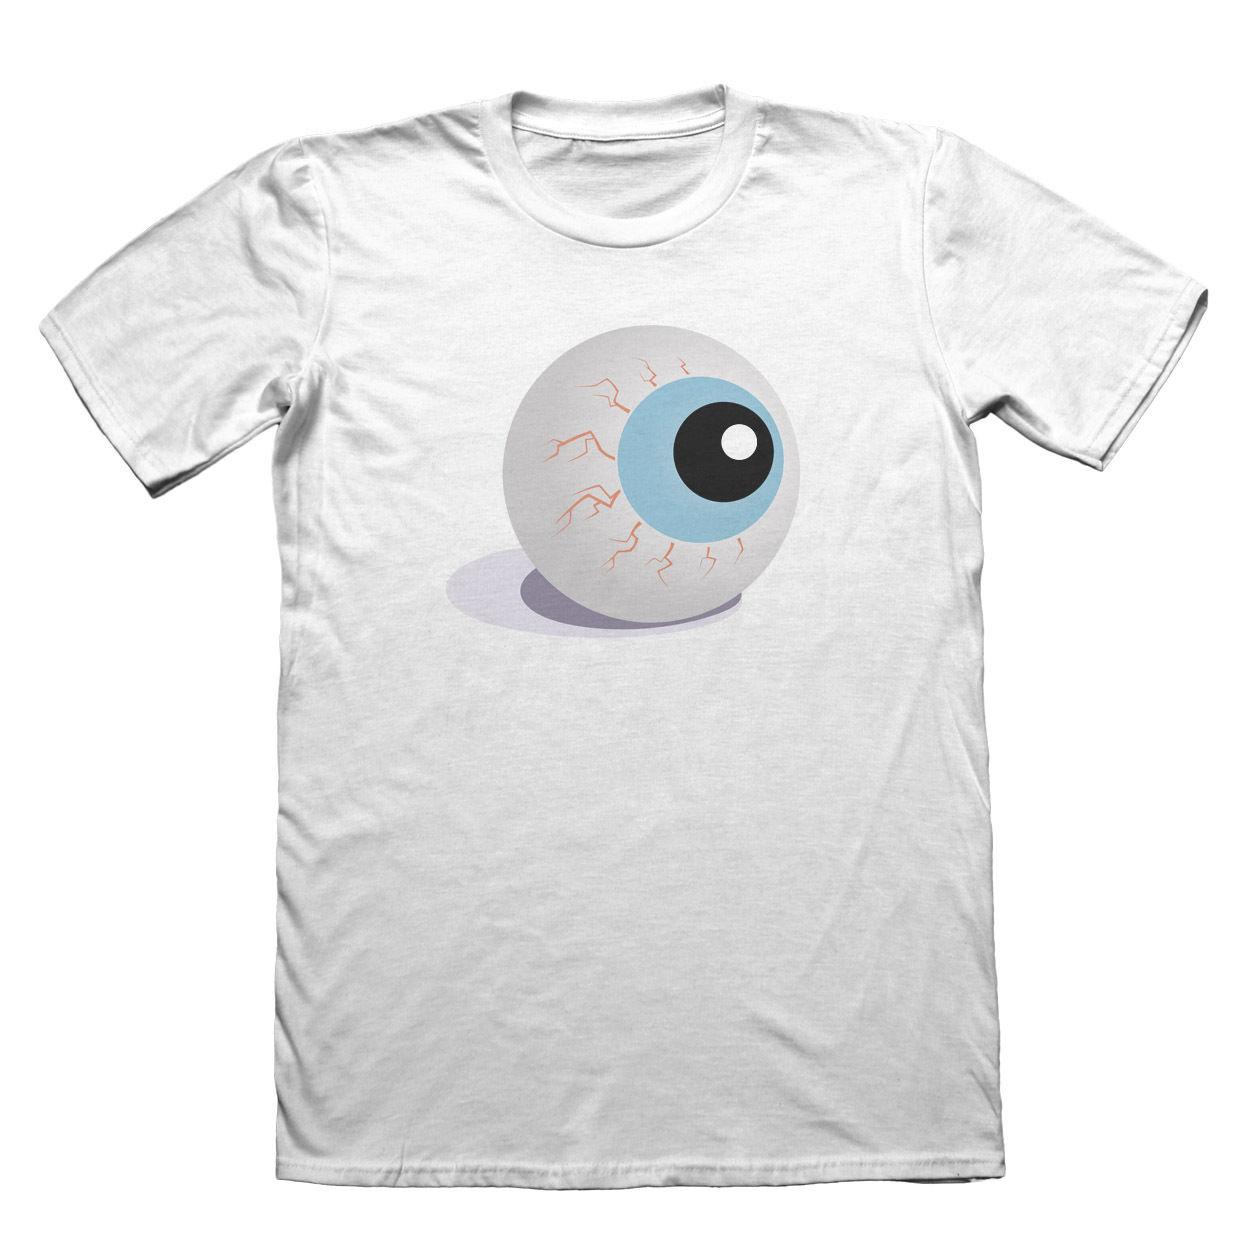 Eye Halloween T-Shirt - Mens Fathers Day Christmas Gift #7205